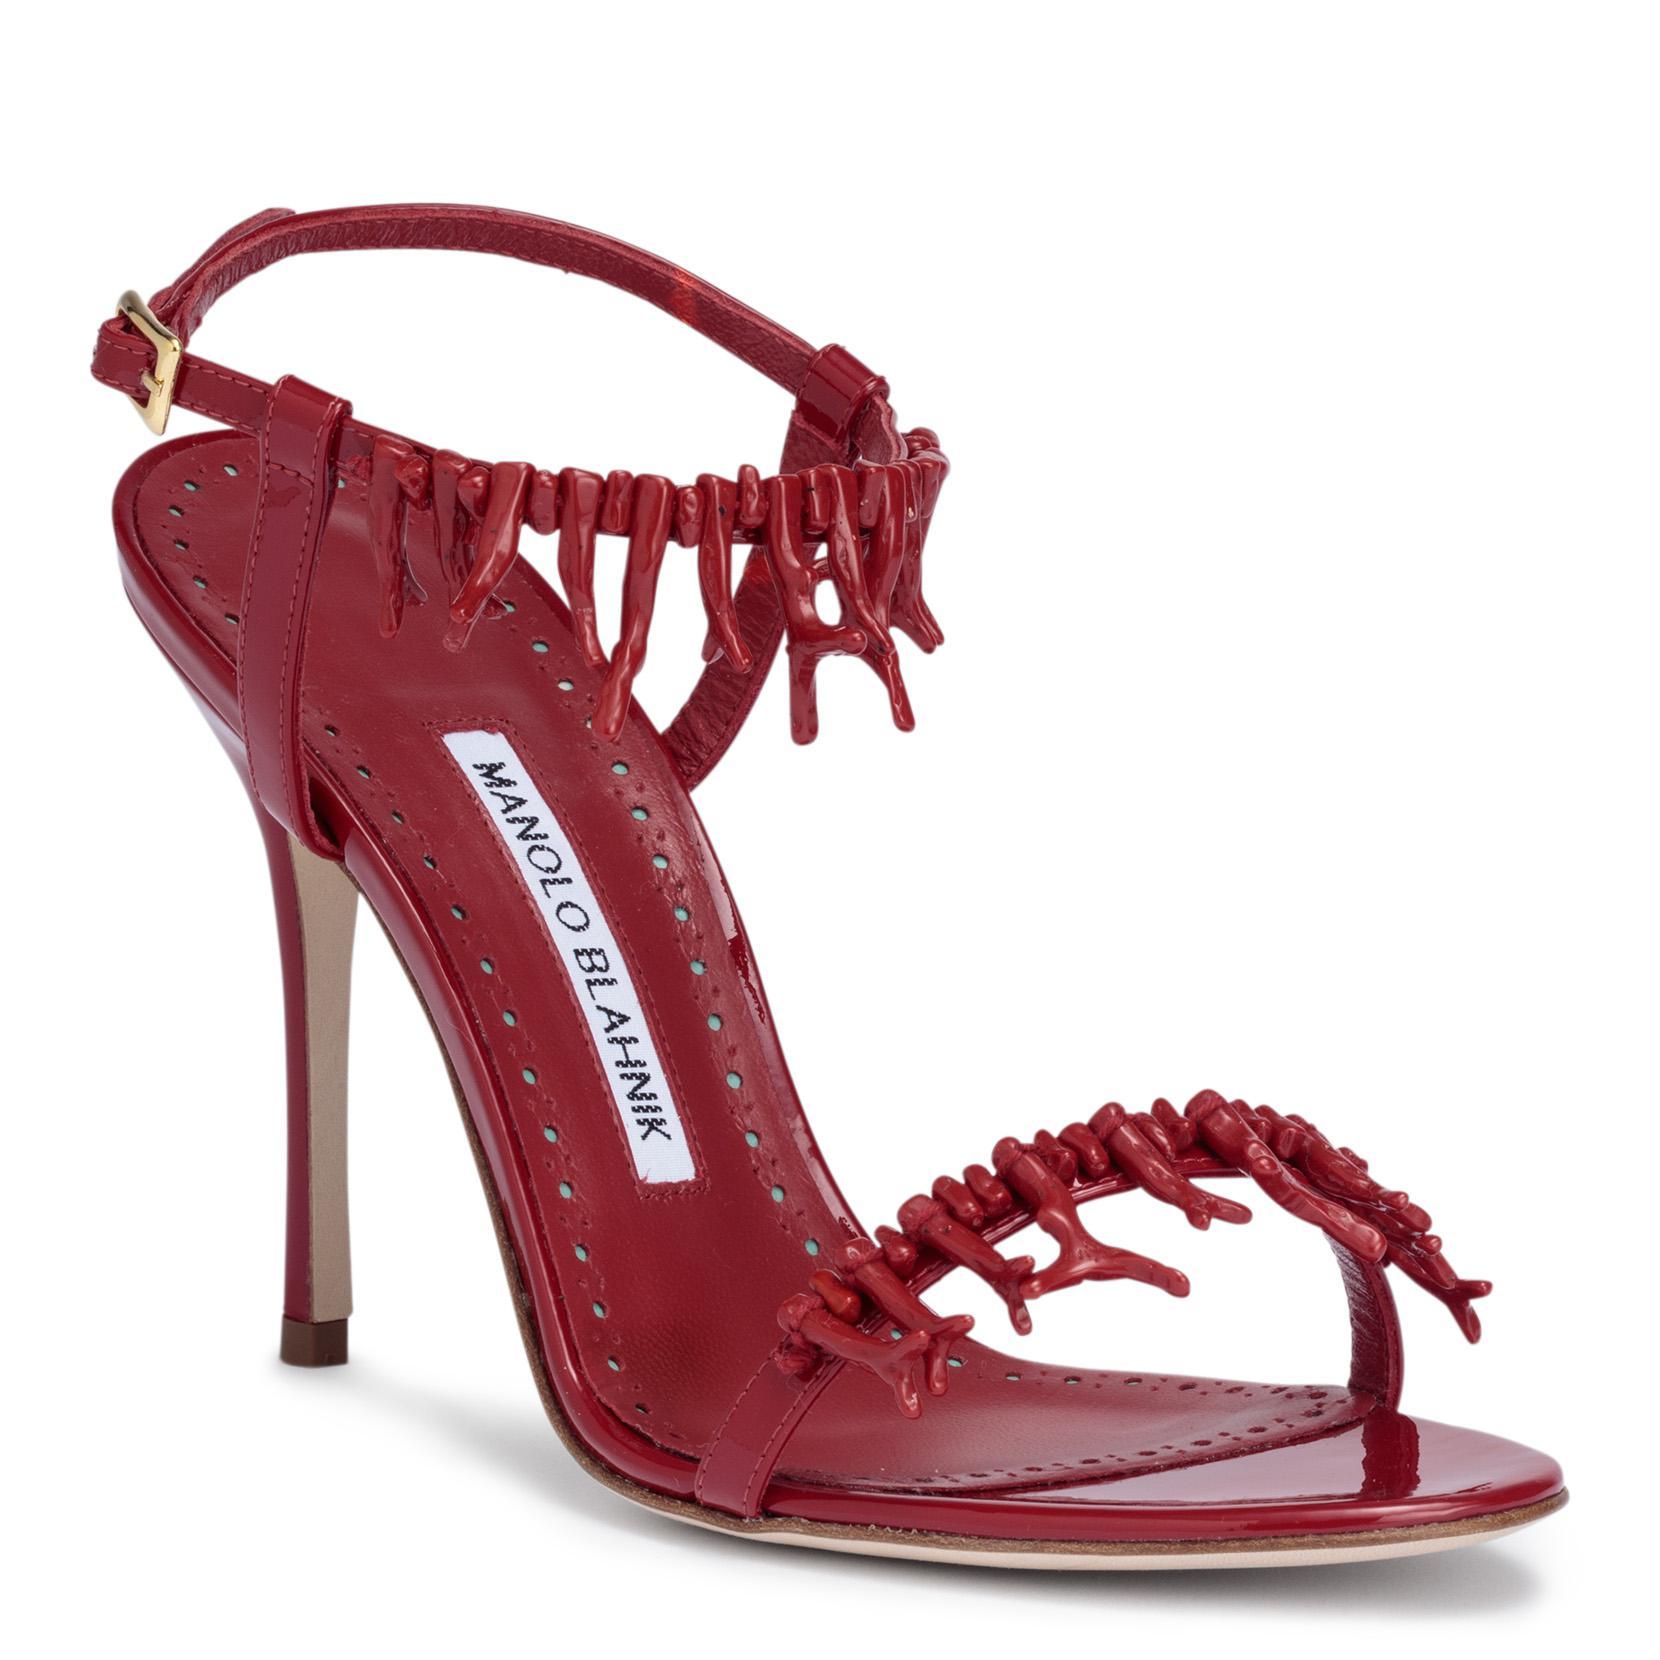 Cienzona 105 red patent sandals Manolo Blahnik Discount Fashionable RqXW8OyL